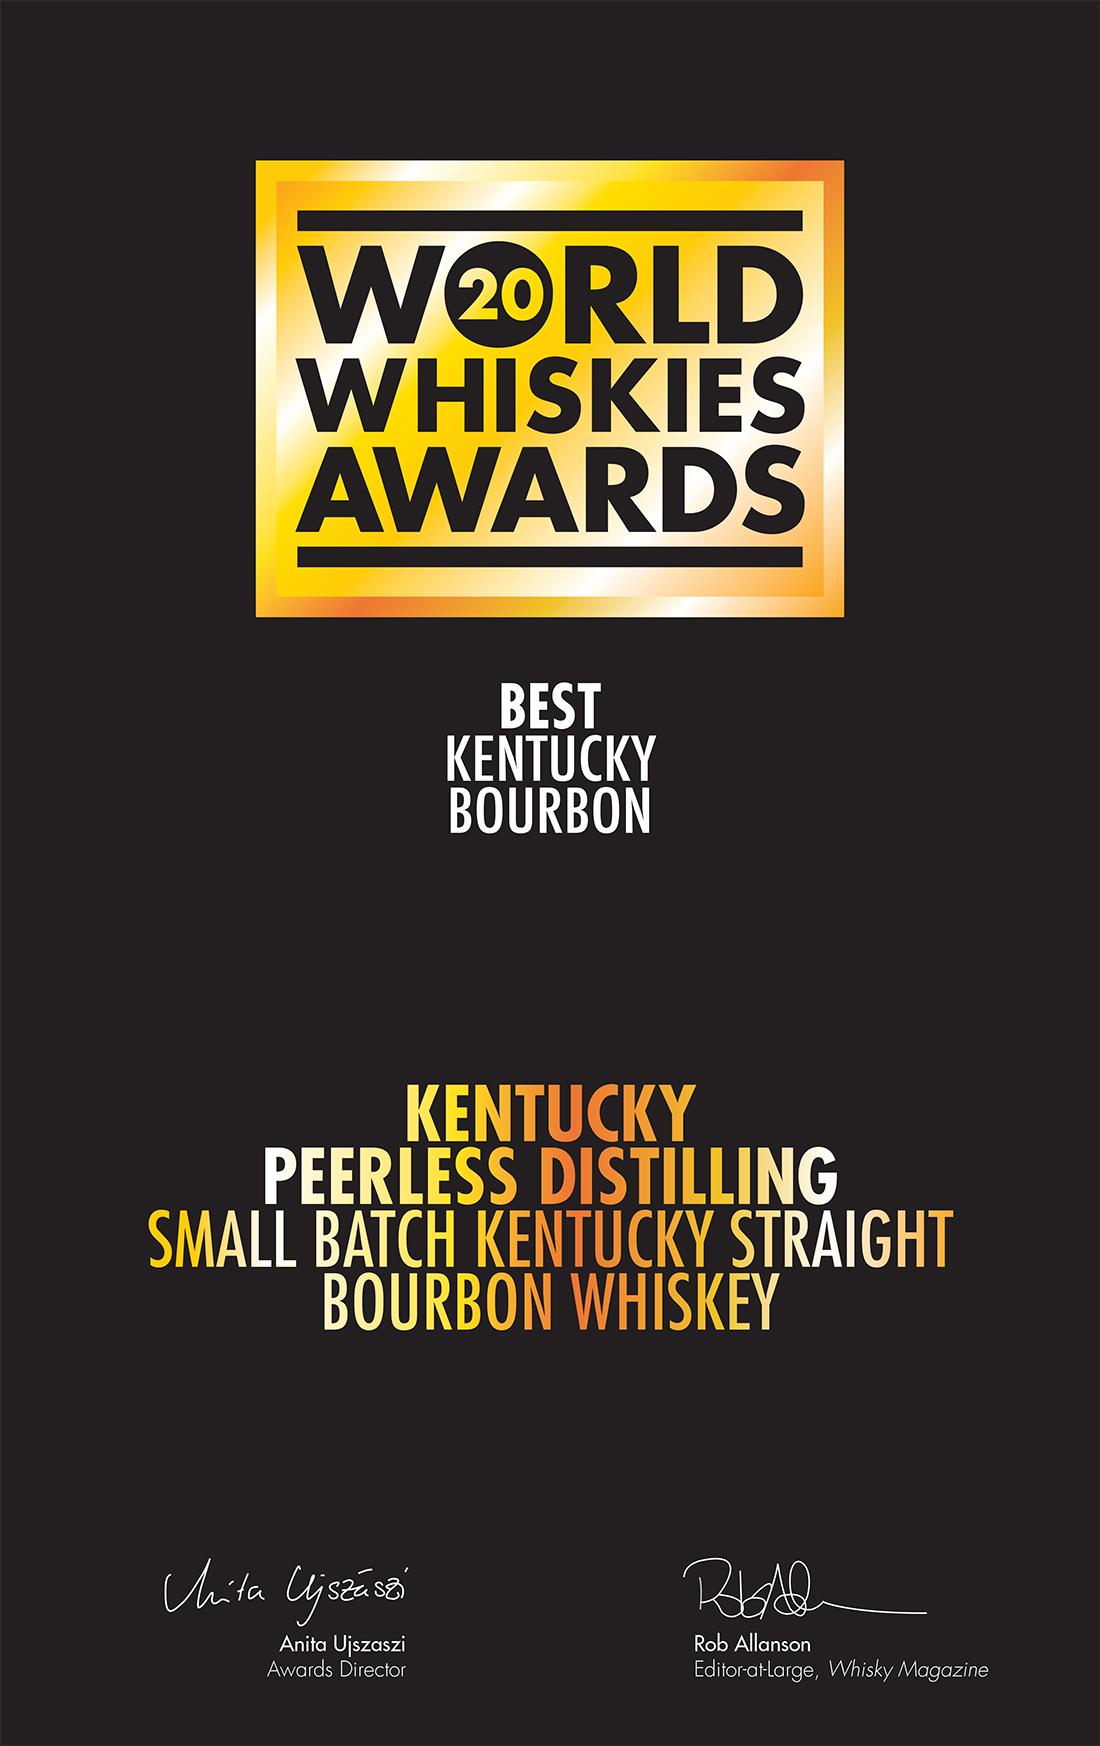 Peerless Small Batch Kentucky Straight Bourbon has been named 'Best Kentucky Bourbon' in the 2020 World Whiskies Awards.